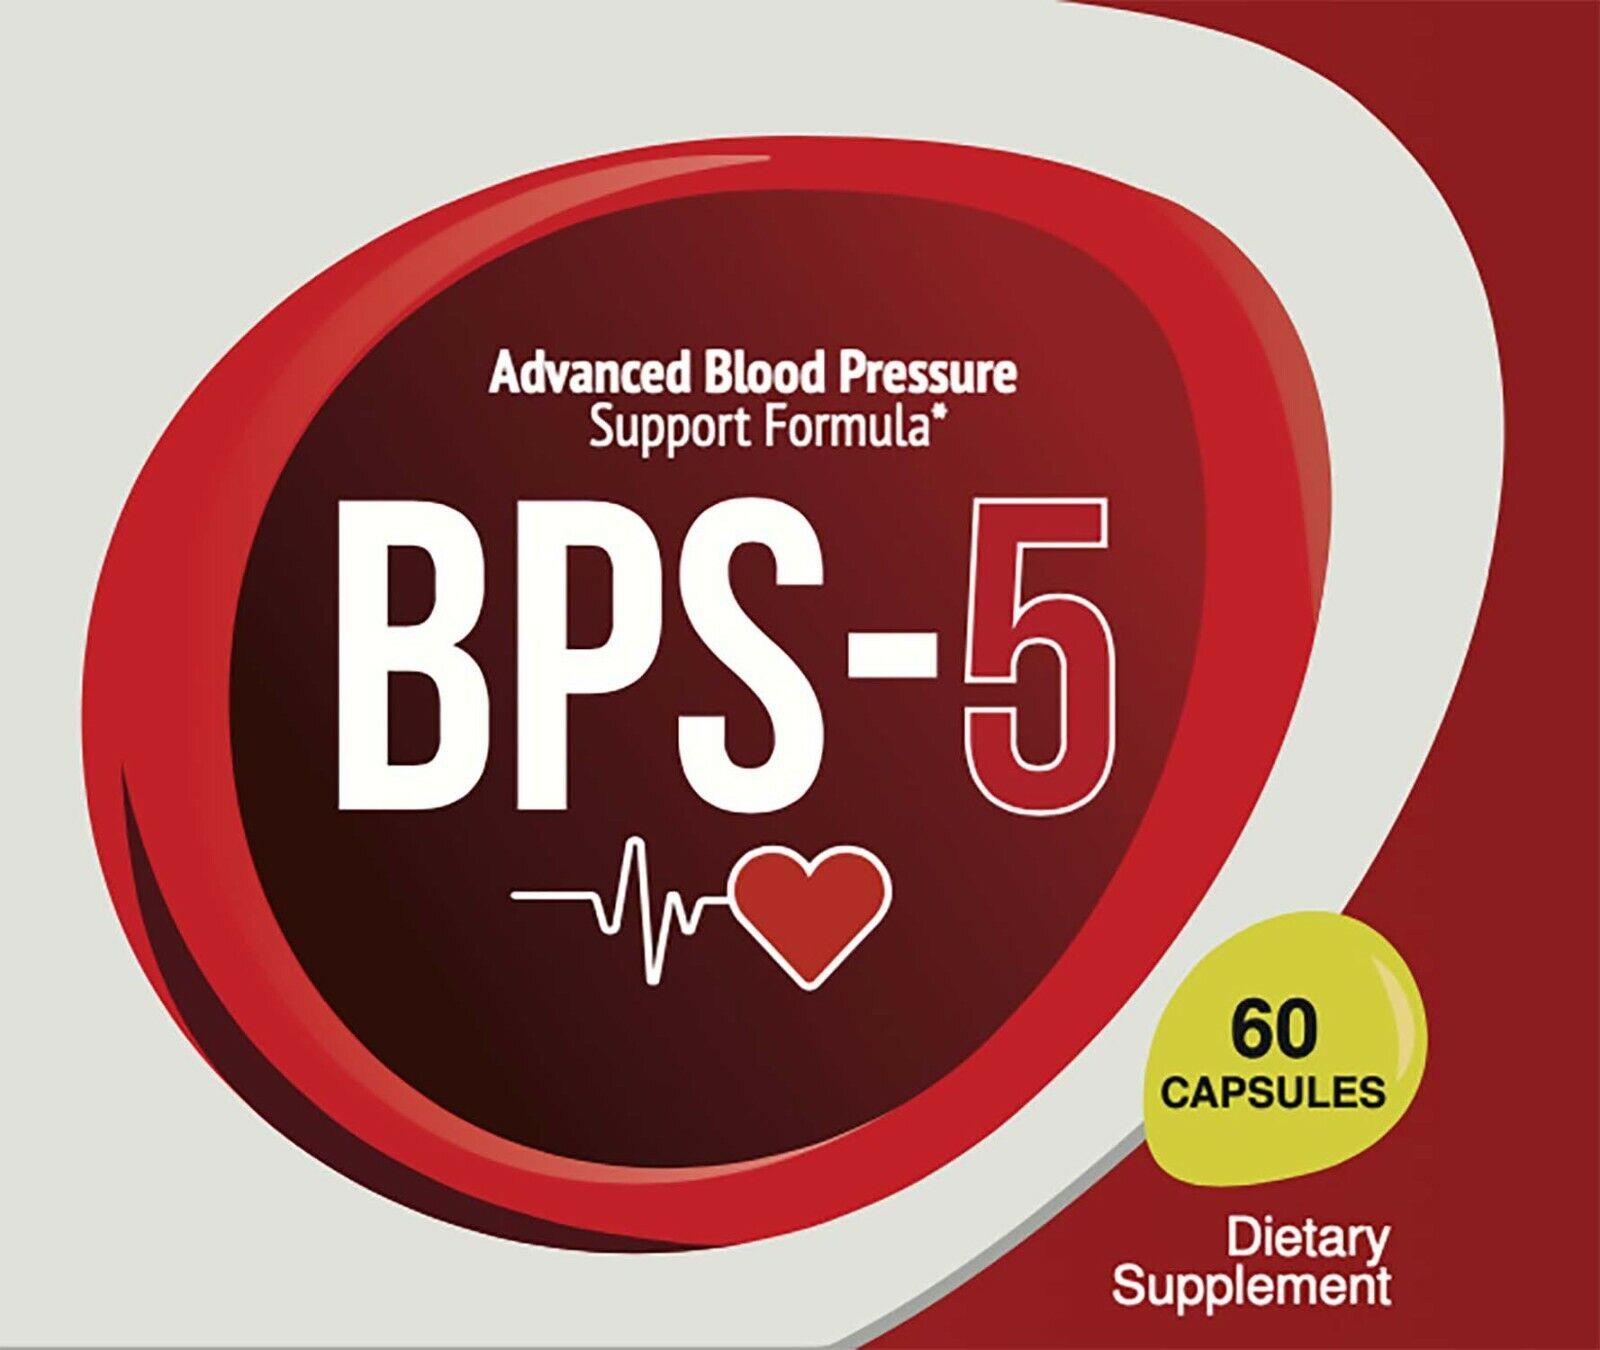 BPS 5 Advanced Blood Pressure Support Formula 60 Capsules